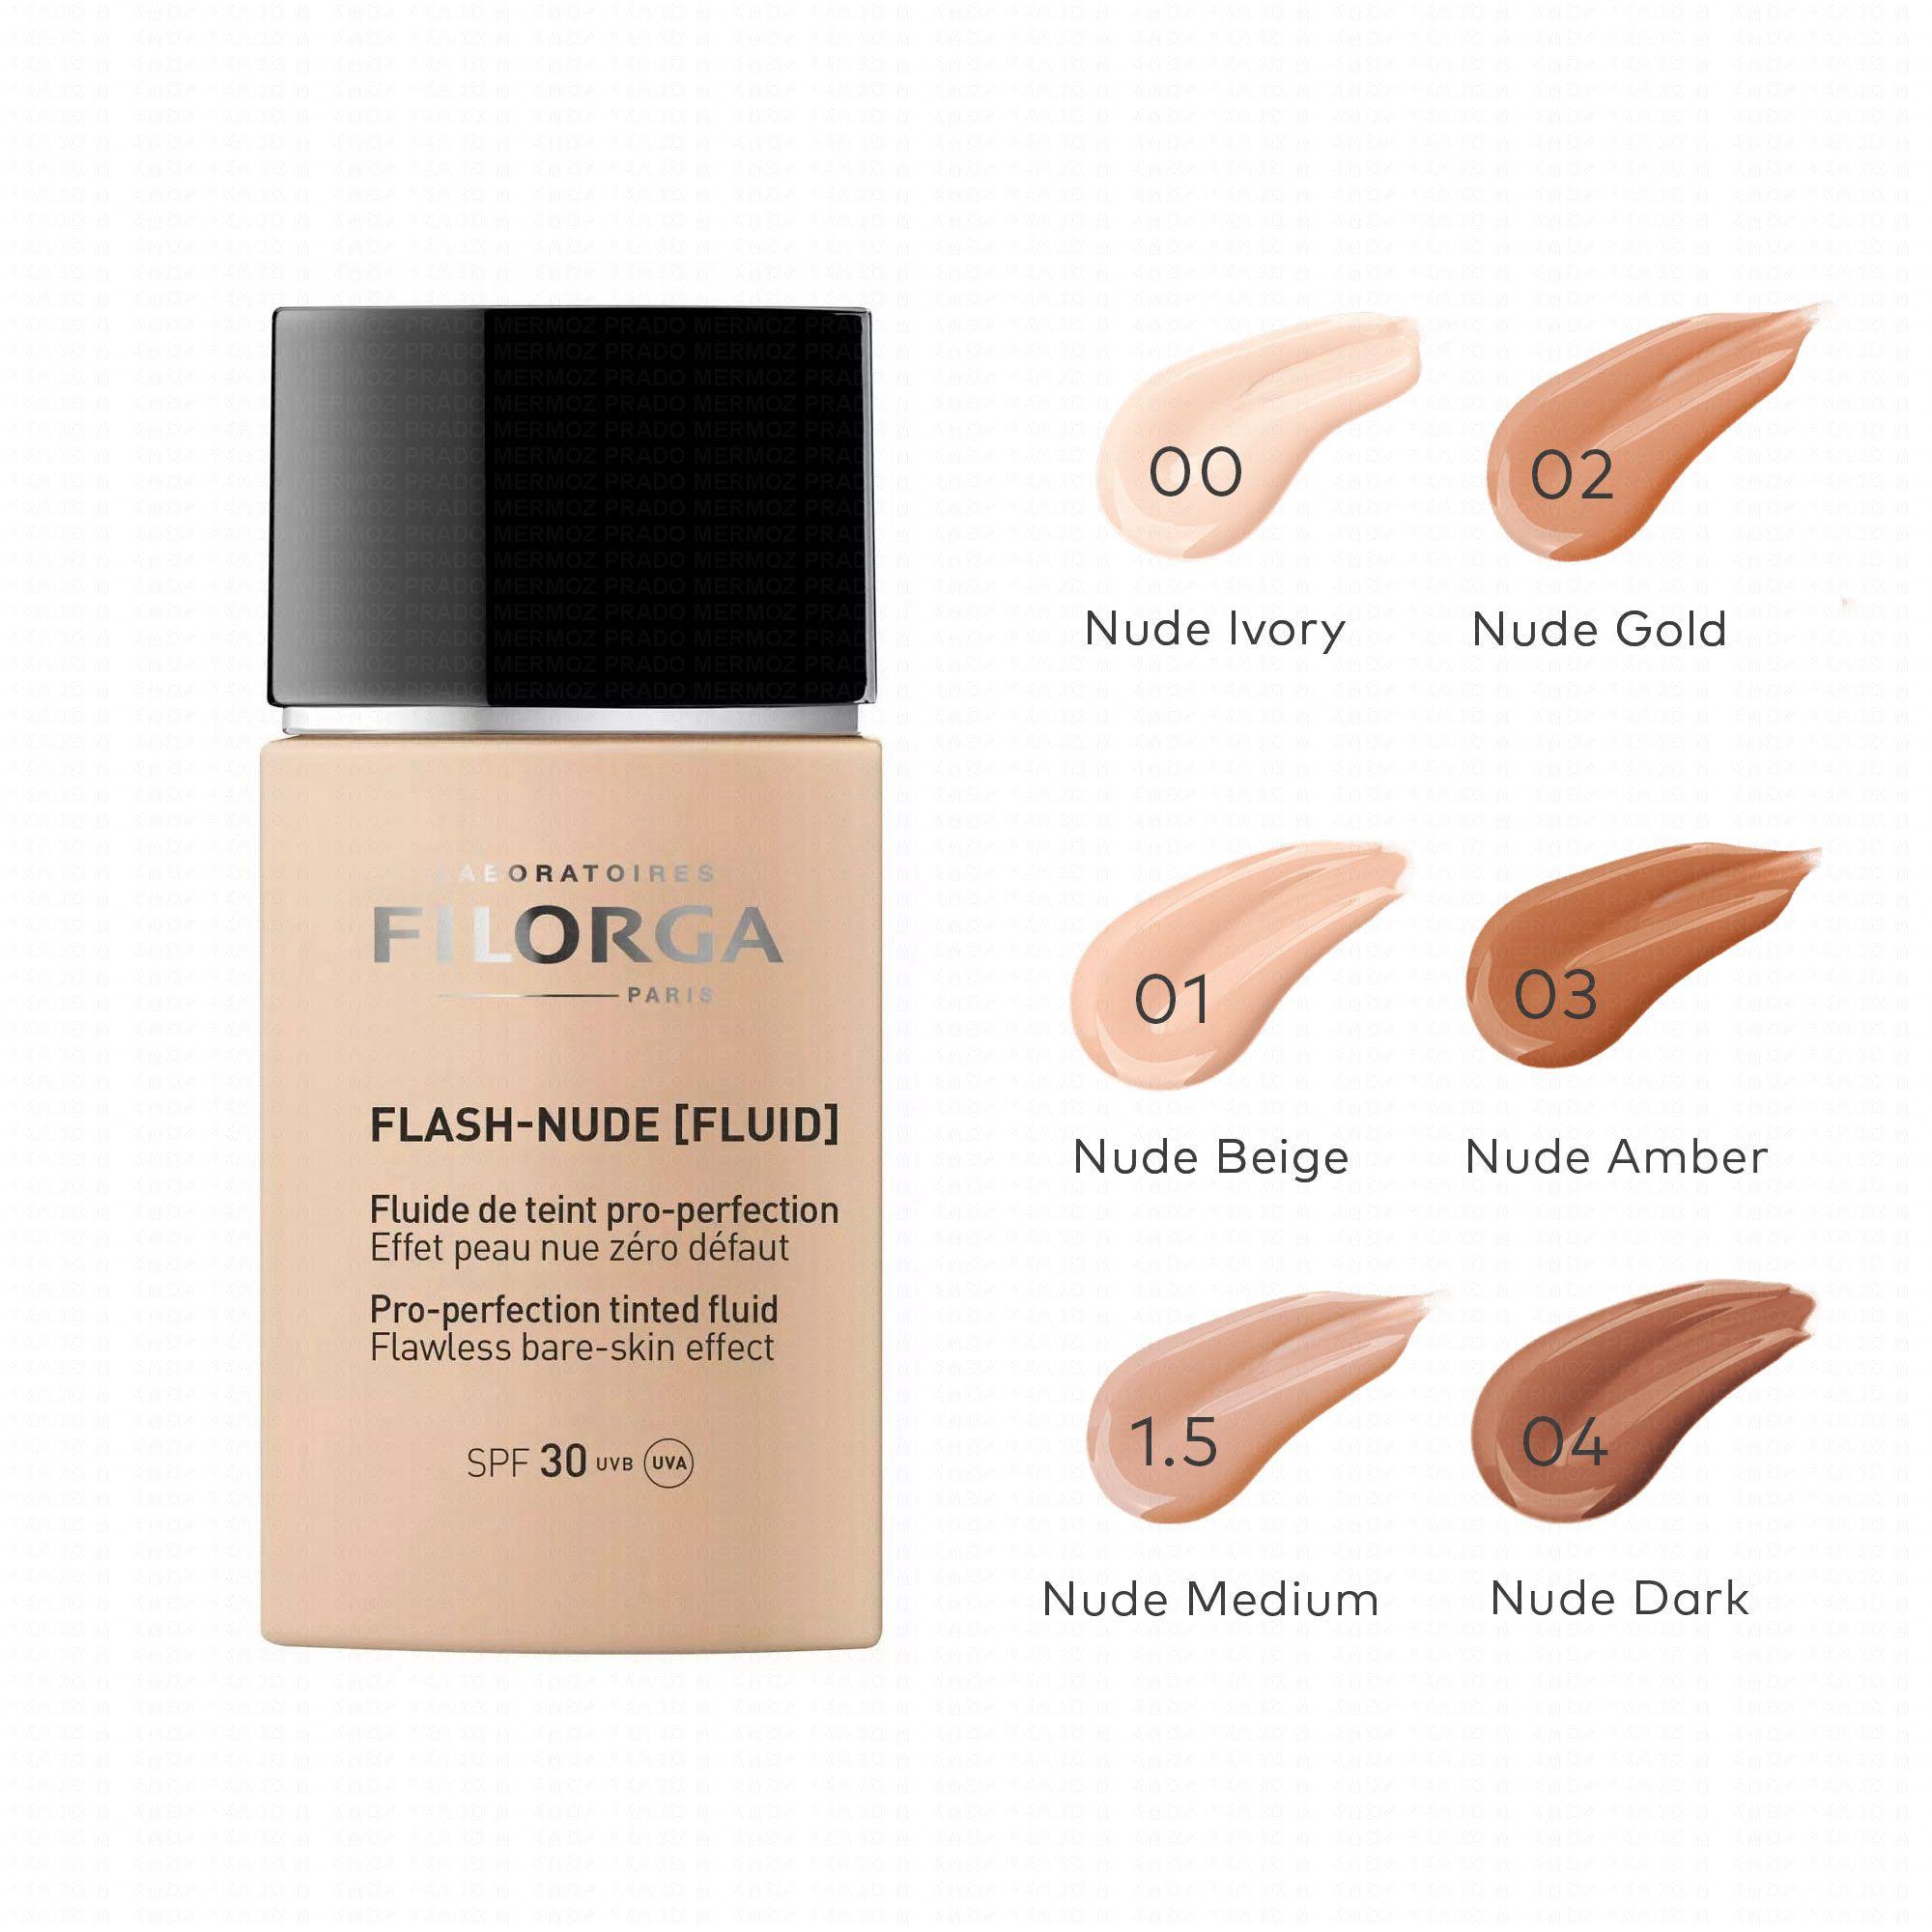 Filorga Flash-Nude Fluid SPF30 1.5 Nude Medium 30 ml